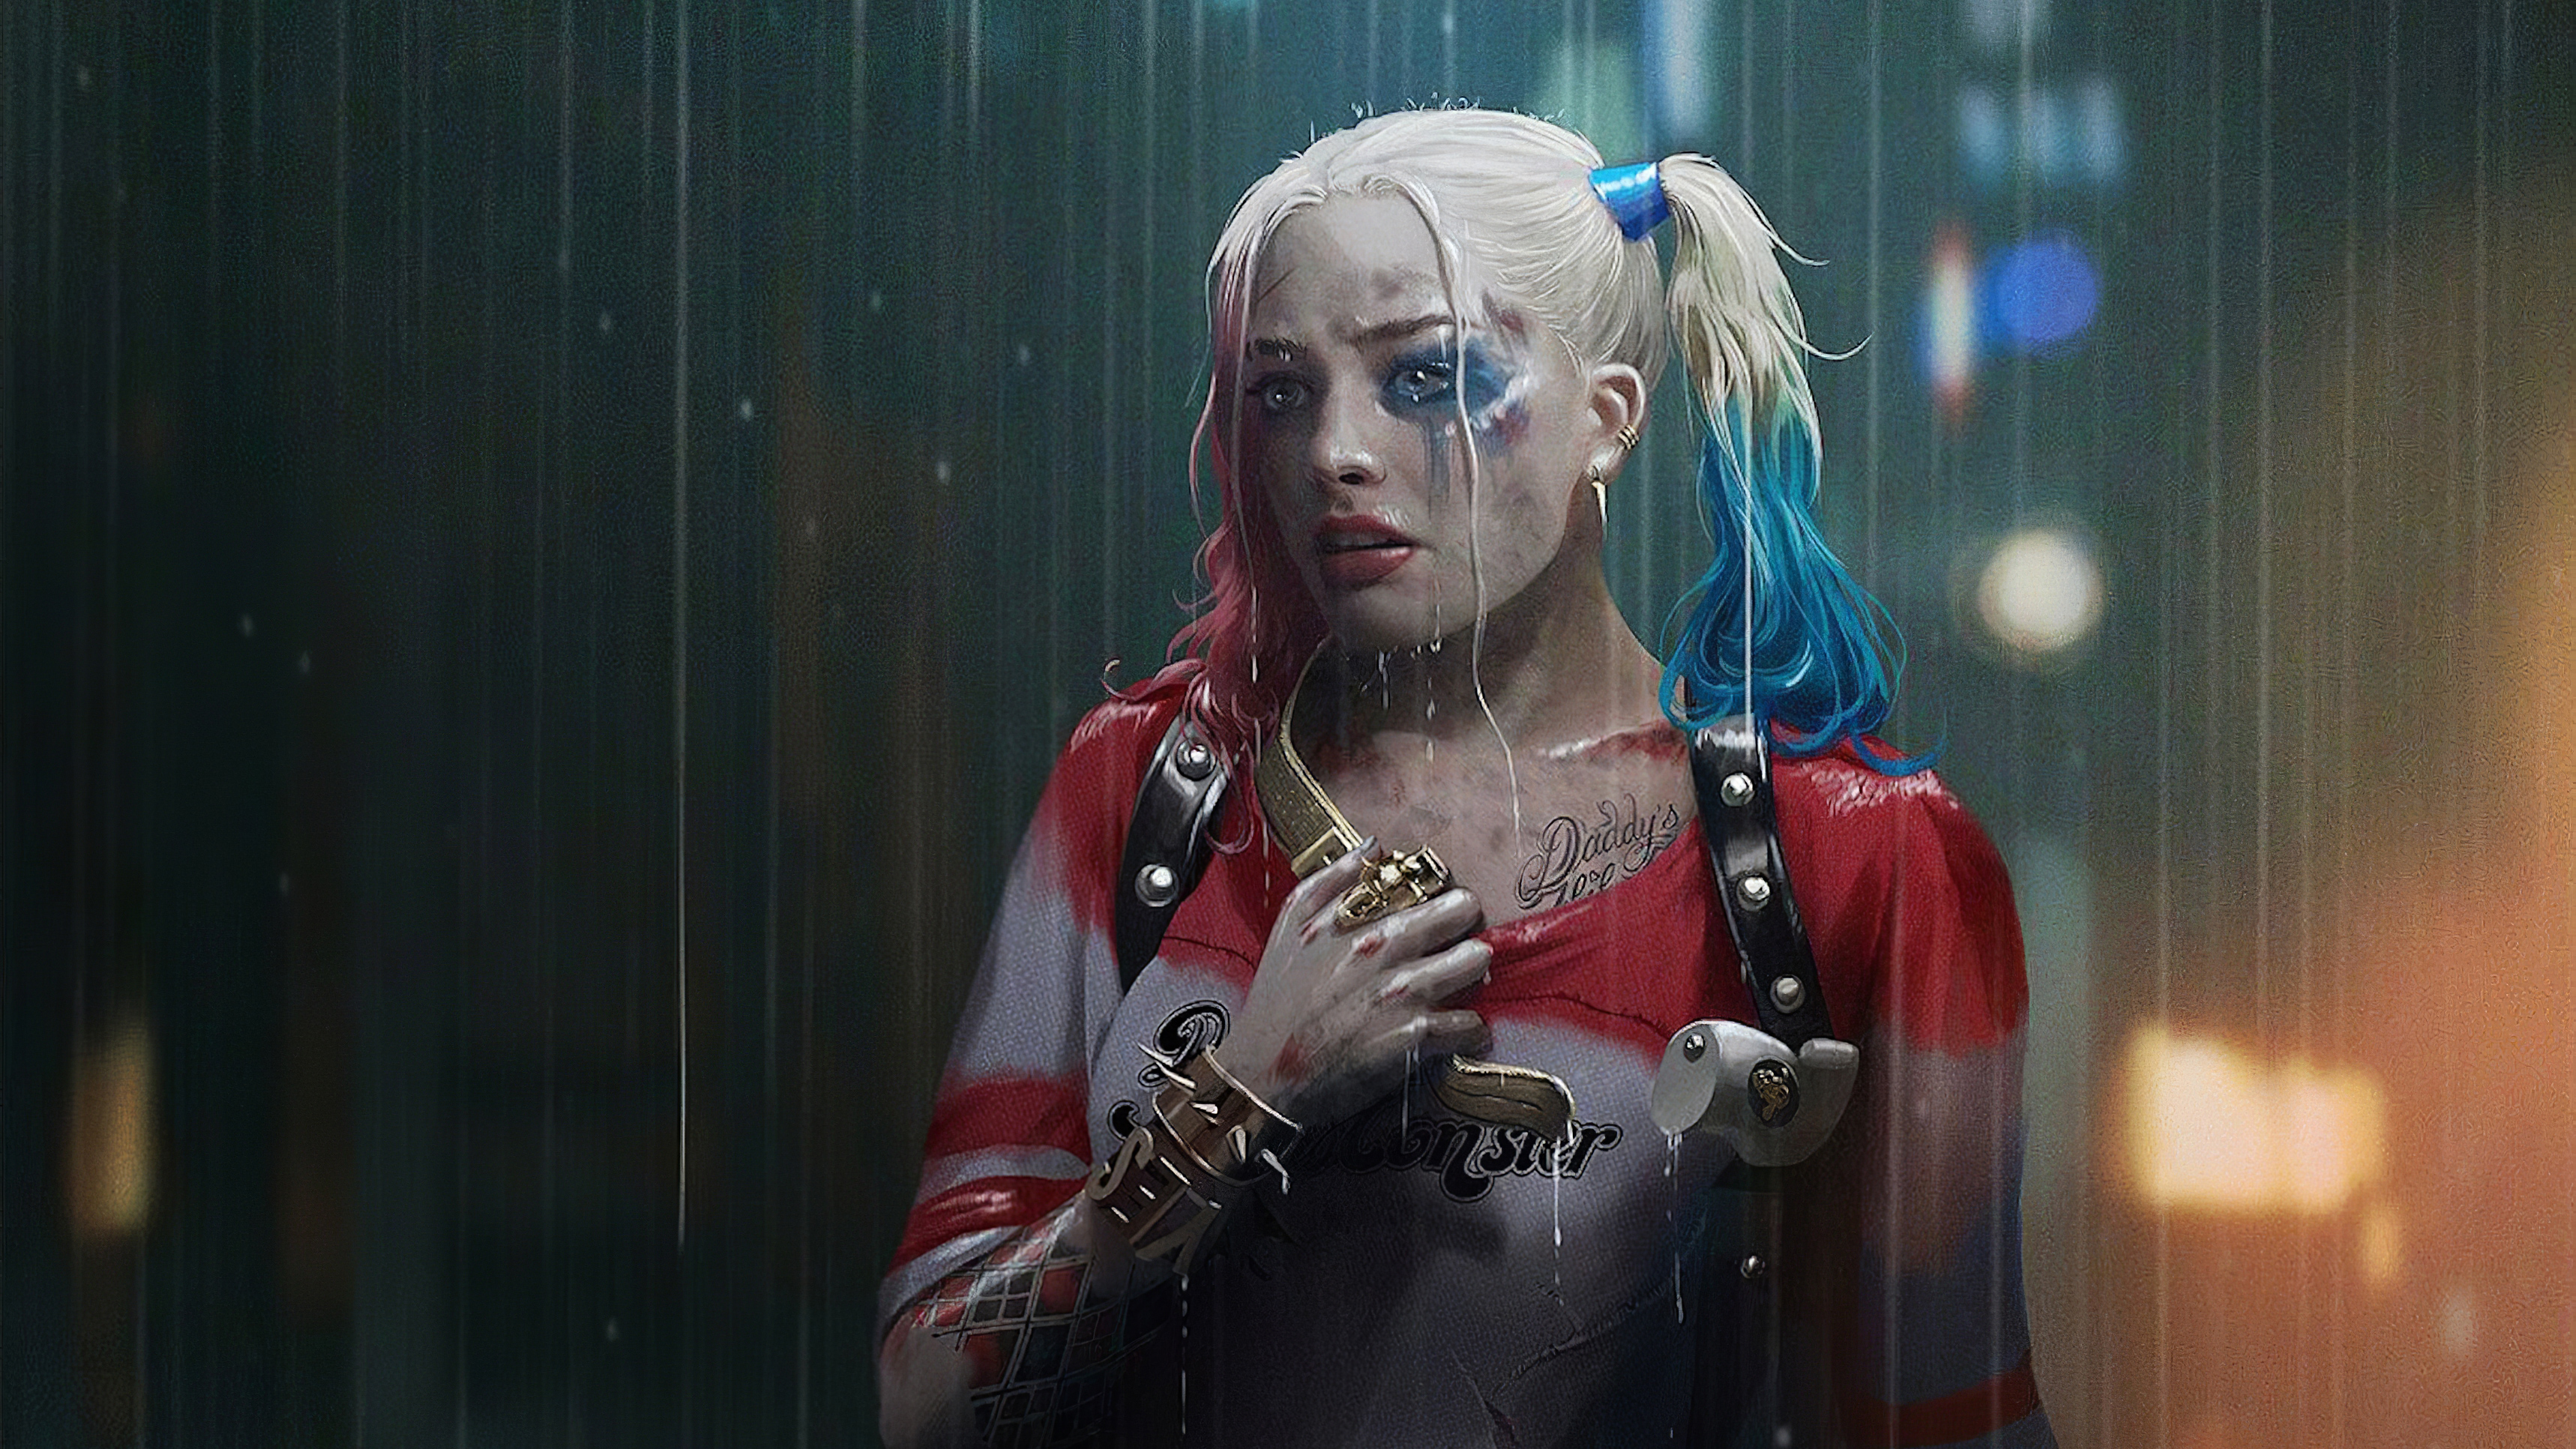 Wallpaper Harley Quinn in the rain